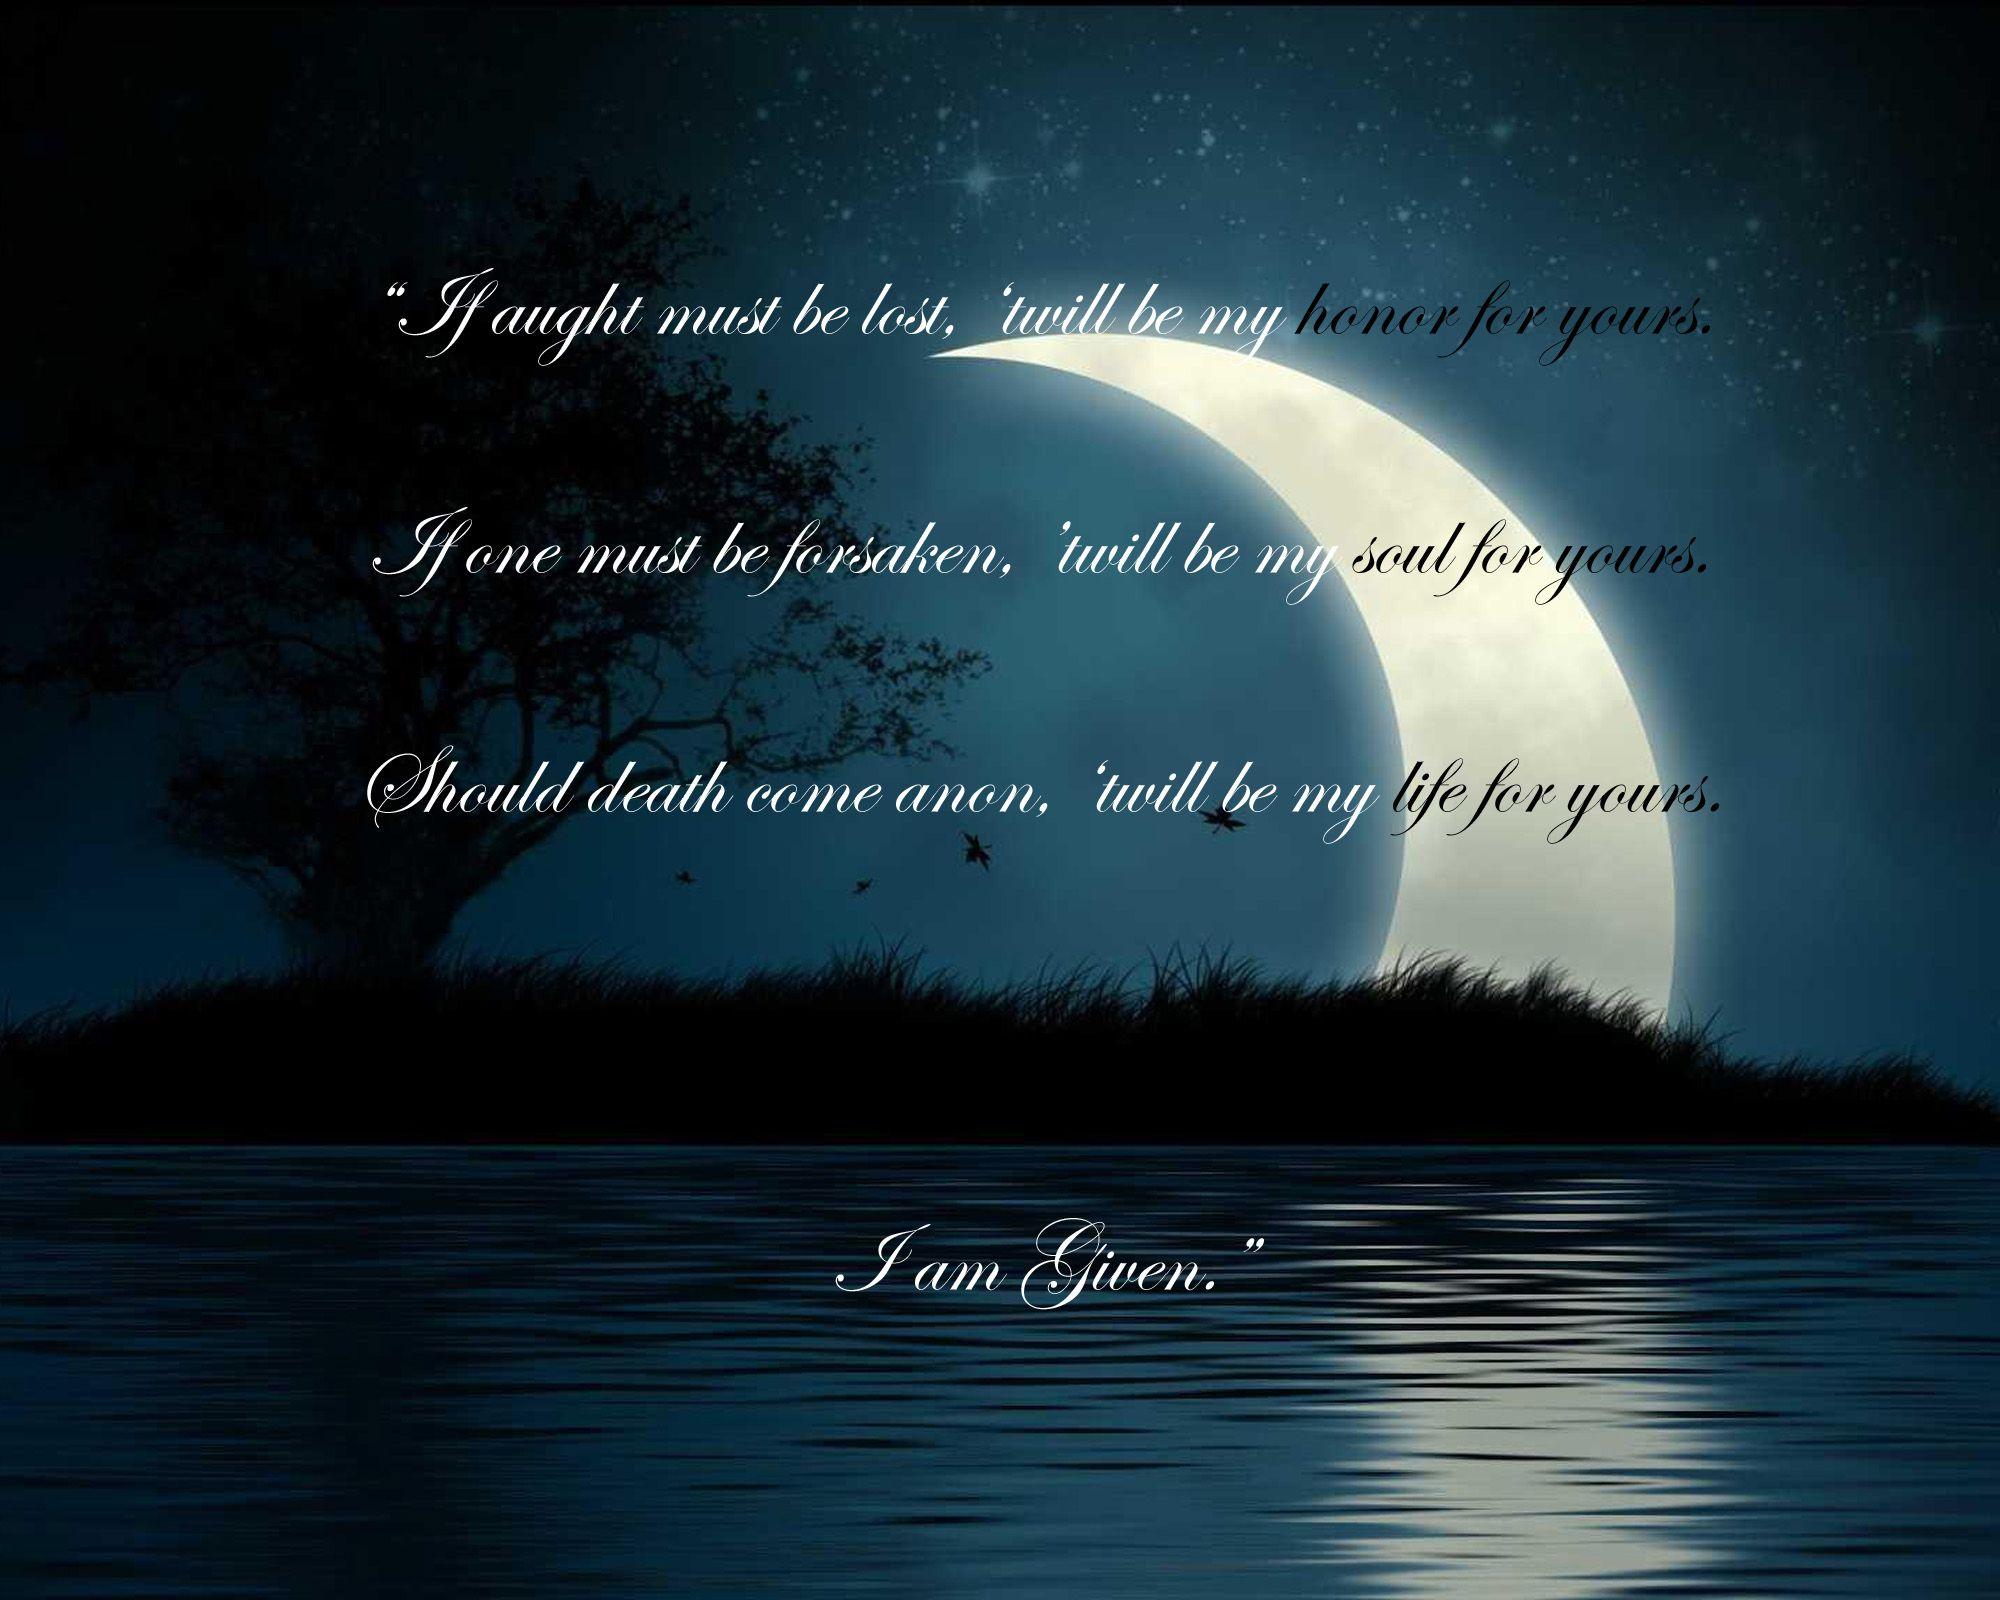 Highlander Quotes Quotekaren Marie Moning Karen Marie Moning  Fave Author